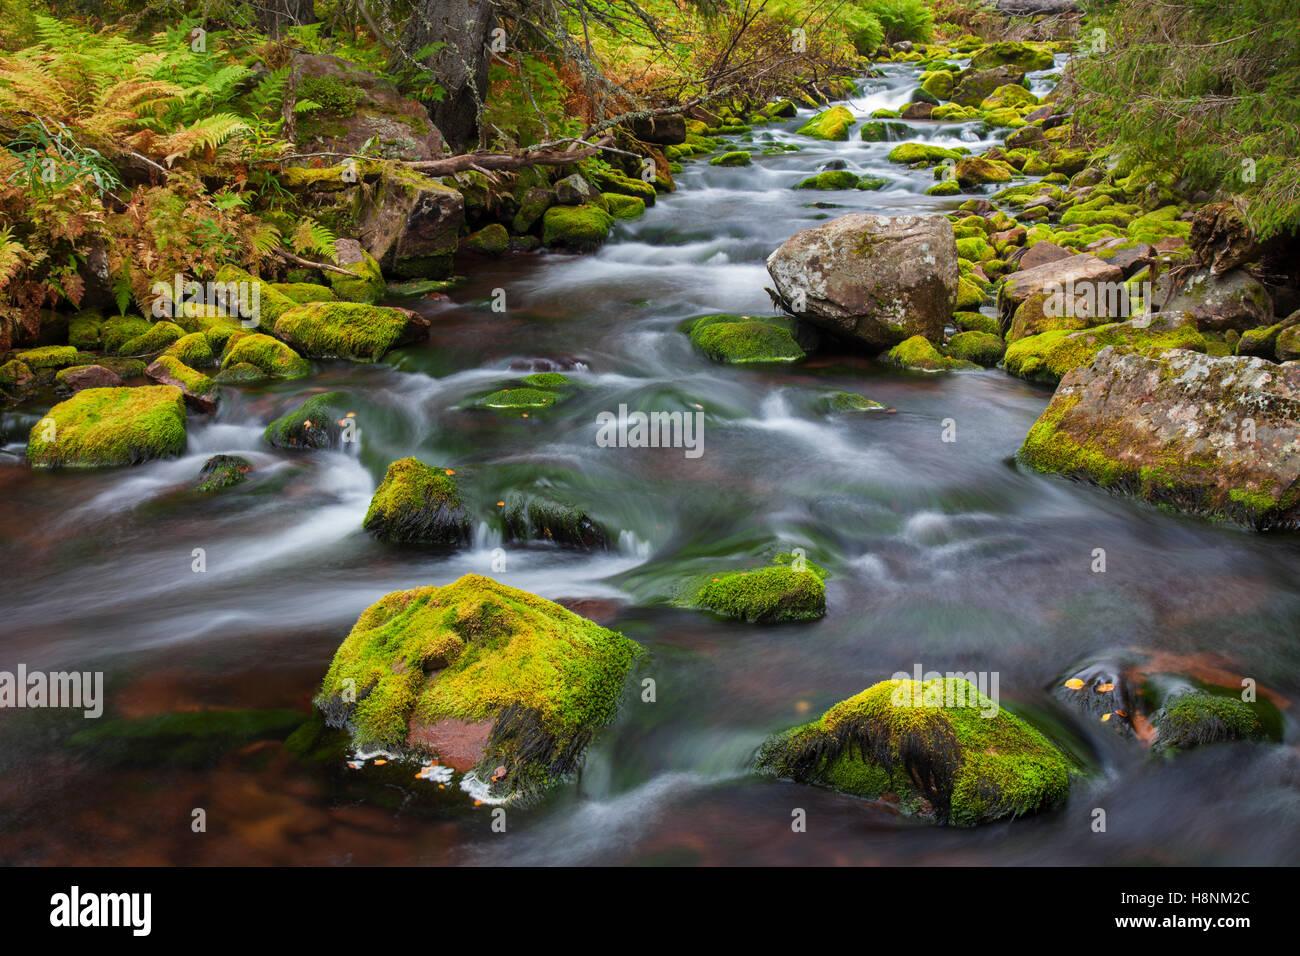 Moss covered boulders in tream Njupan / Njupån in autumn forest, Fulufjaellet / Fulufjället National Park, - Stock Image